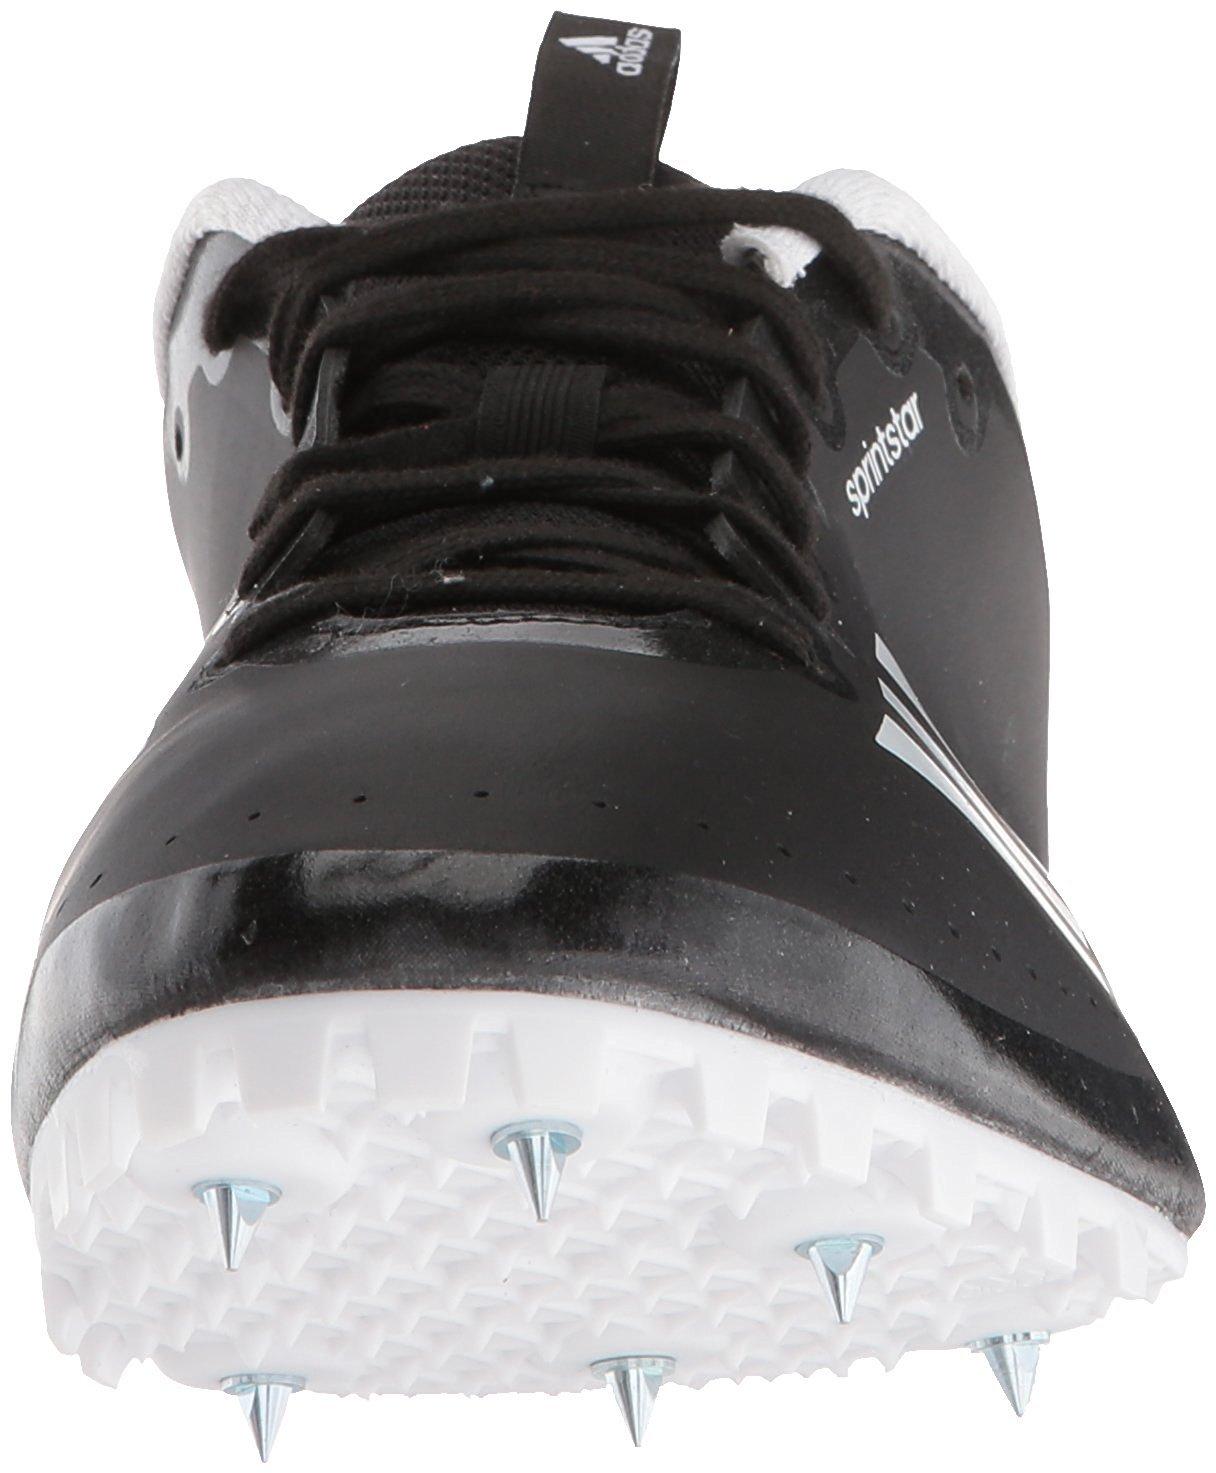 adidas Women's Sprintstar w, core Black/Orange/White, 12 M US by adidas (Image #2)